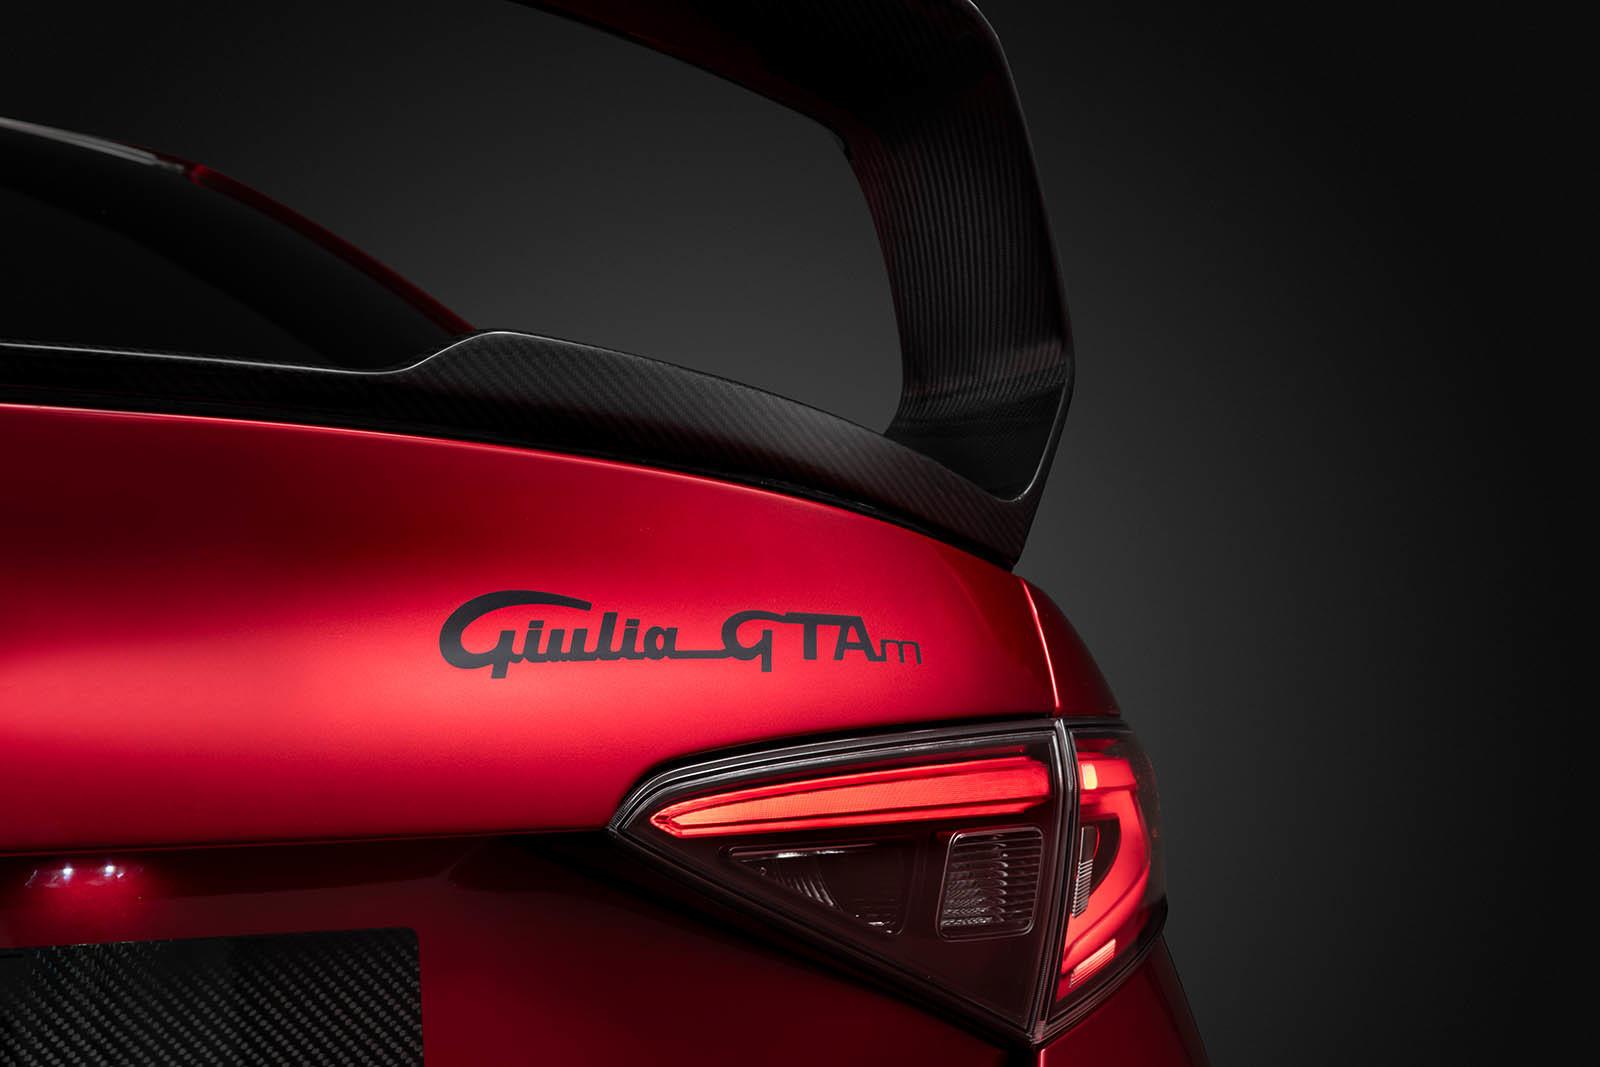 Alfa Romeo Giulia GTA y GTAm